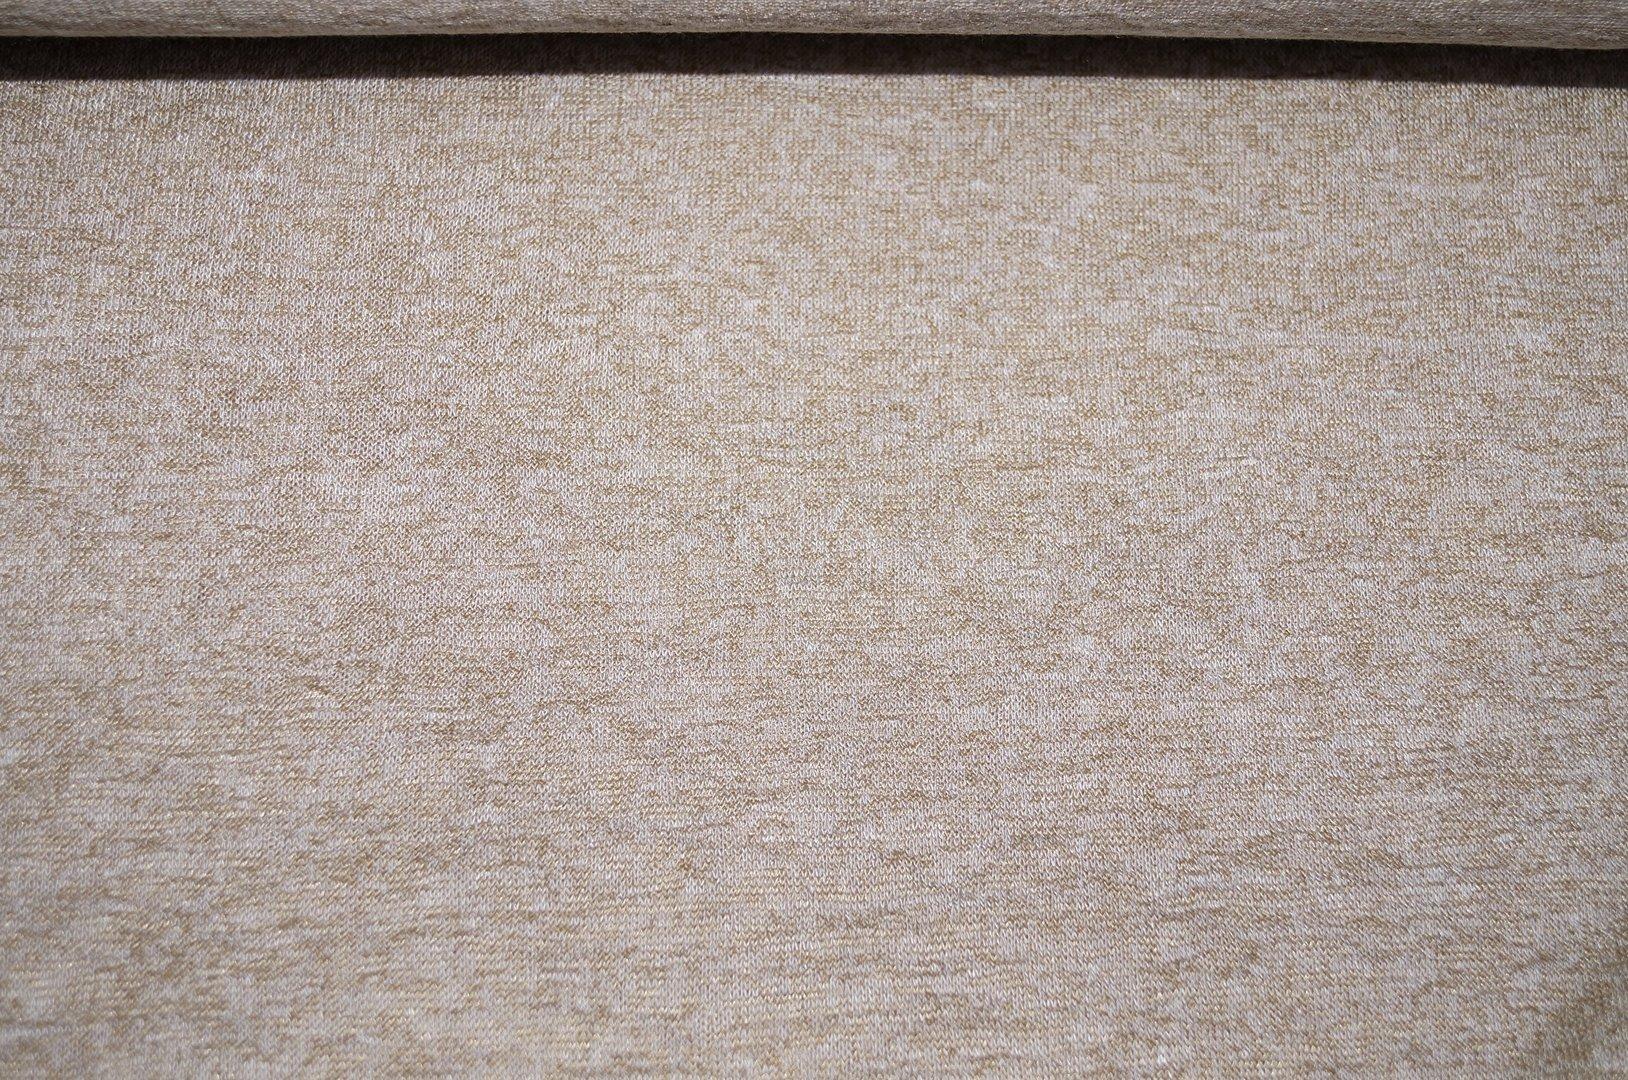 online stoffe kaufen feinstrick stoff hellbraun meliert. Black Bedroom Furniture Sets. Home Design Ideas